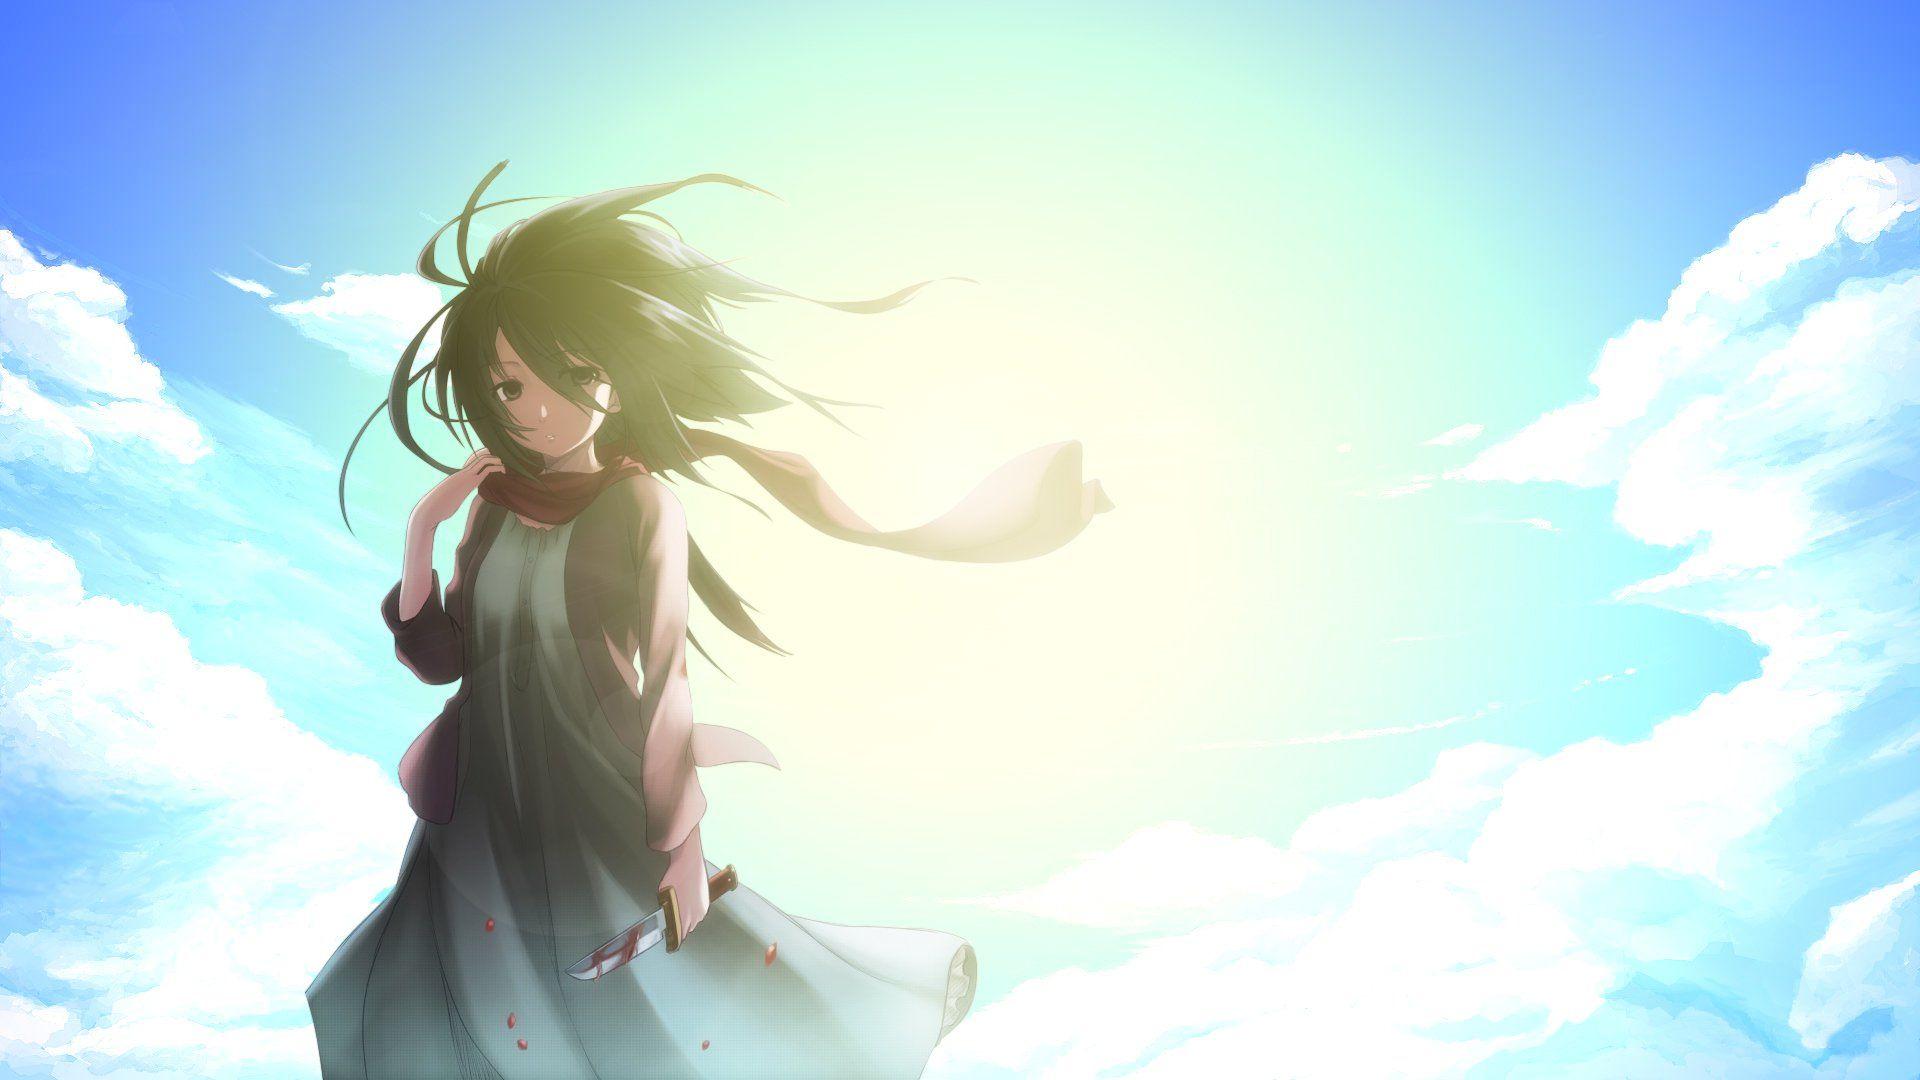 Anime Attack On Titan Shingeki No Kyojin Mikasa Ackerman Wallpaper